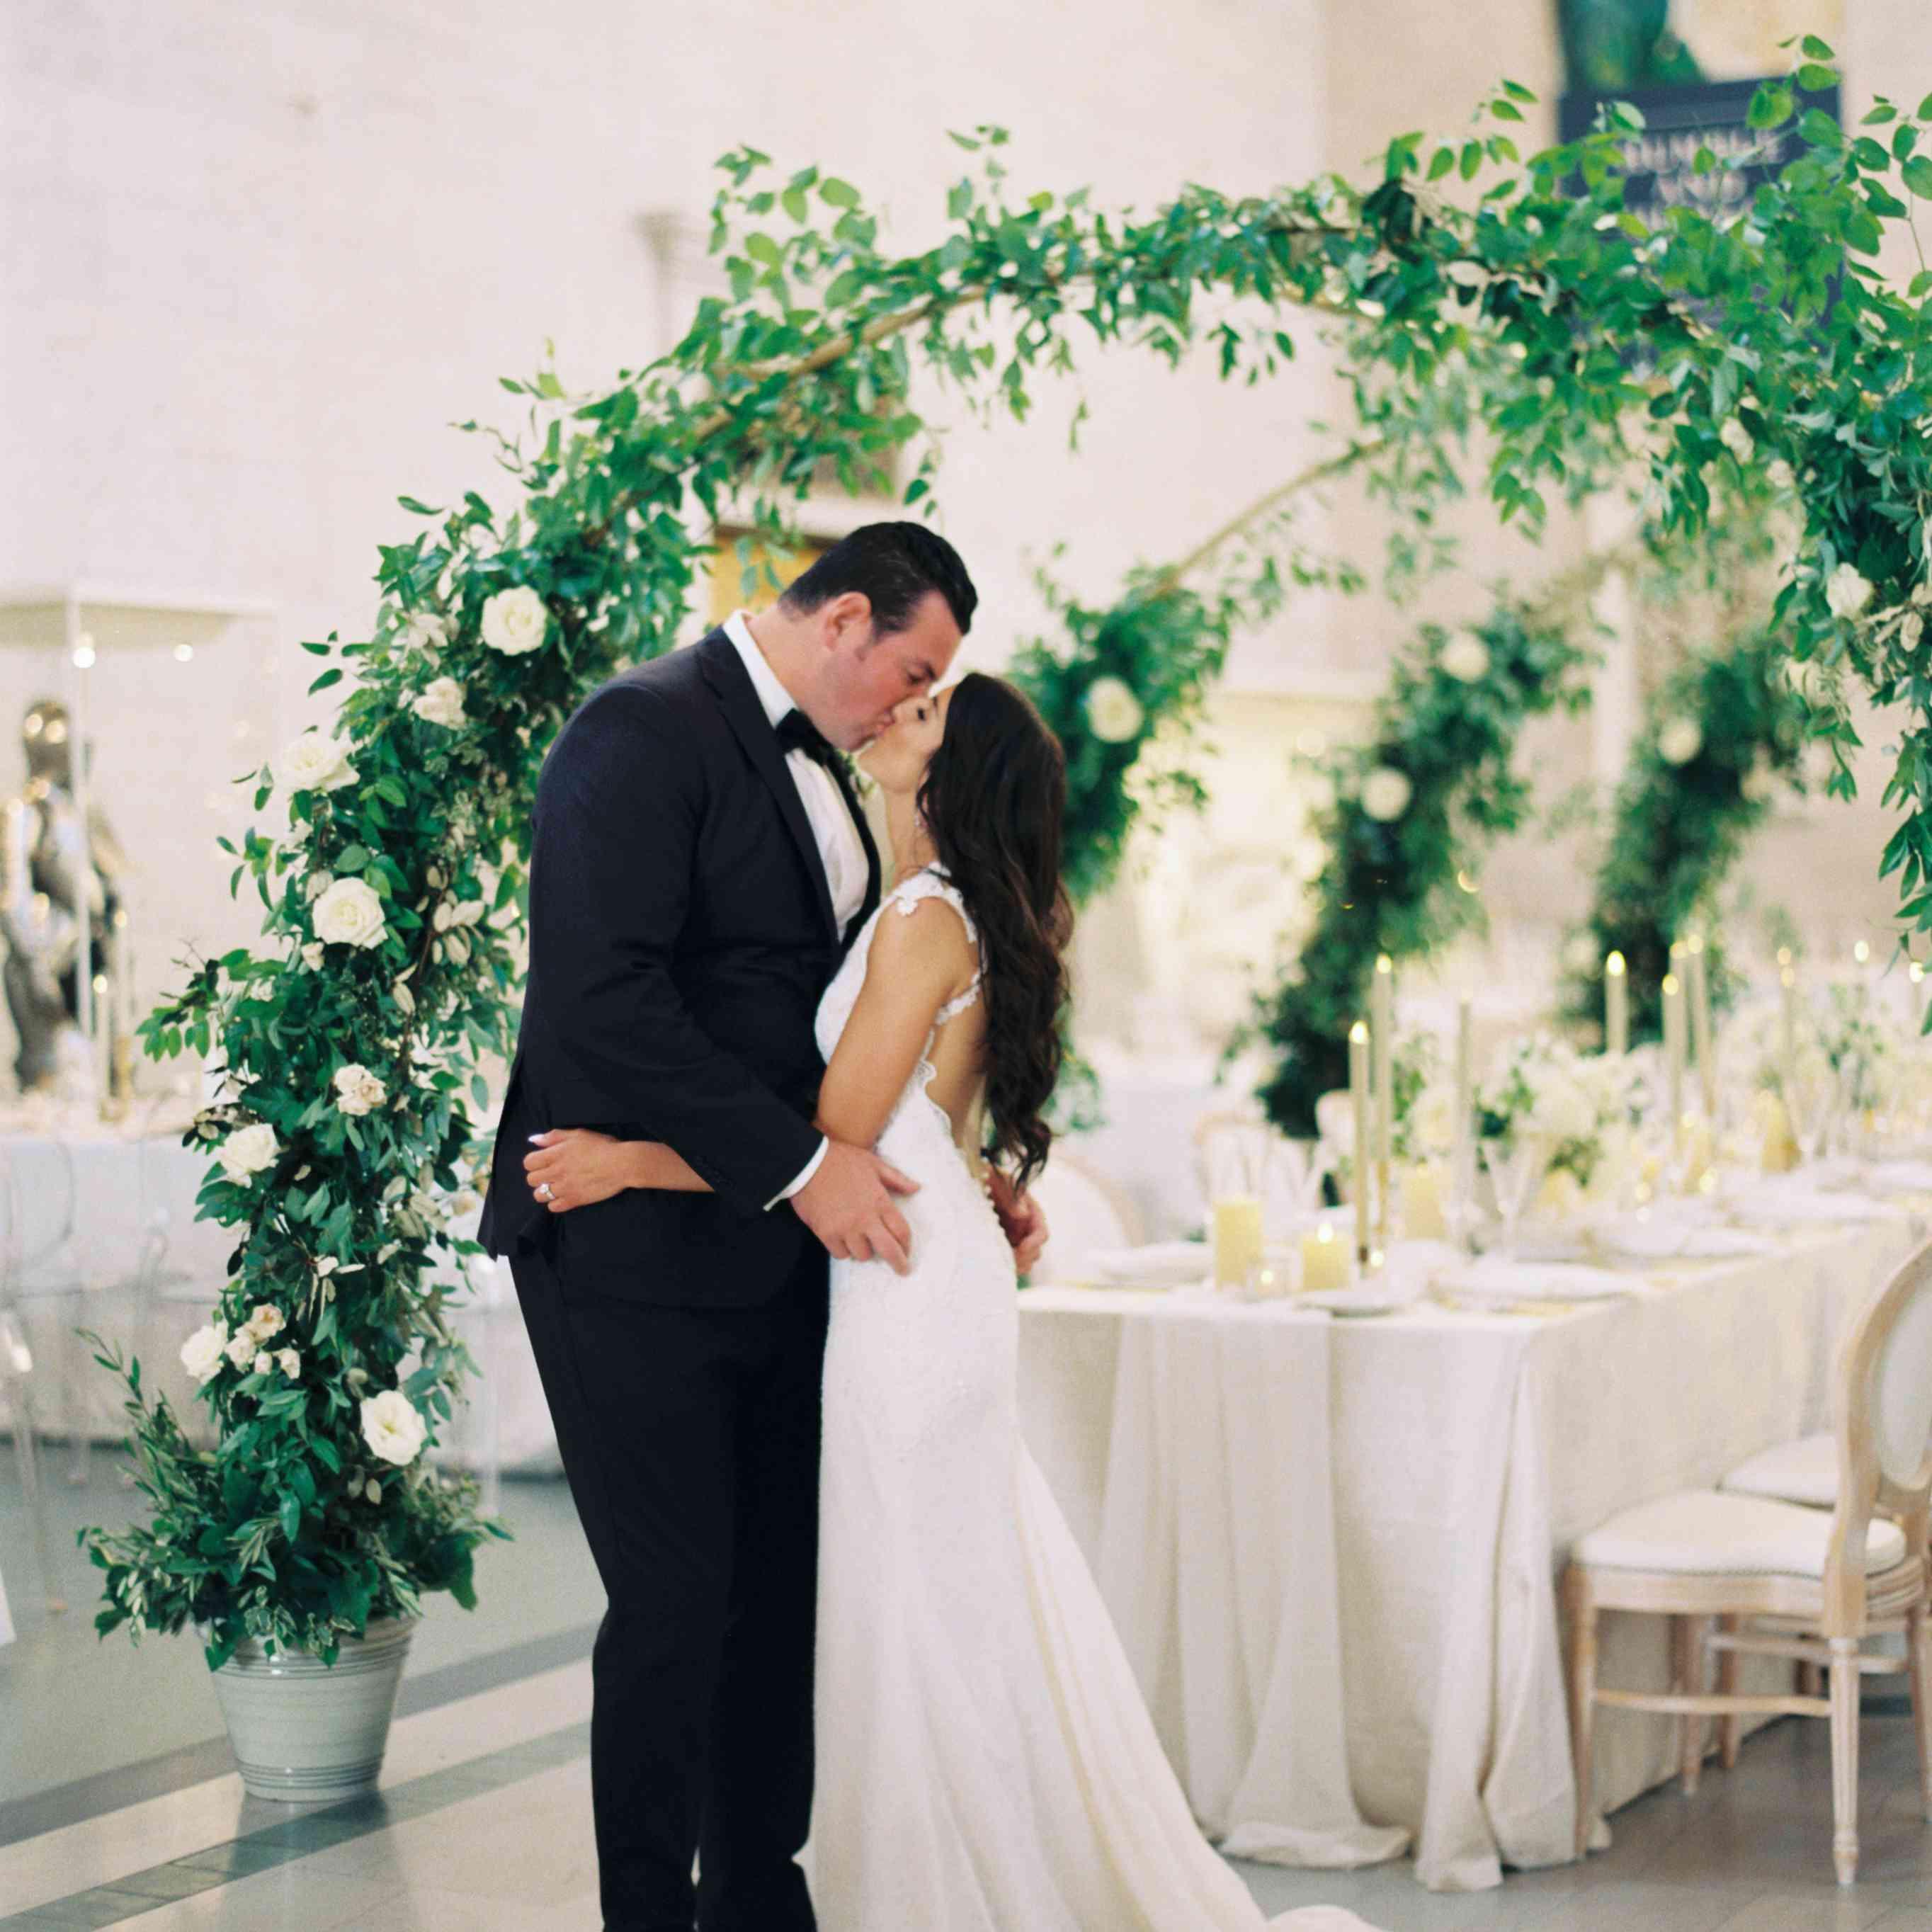 The couple shares a kiss